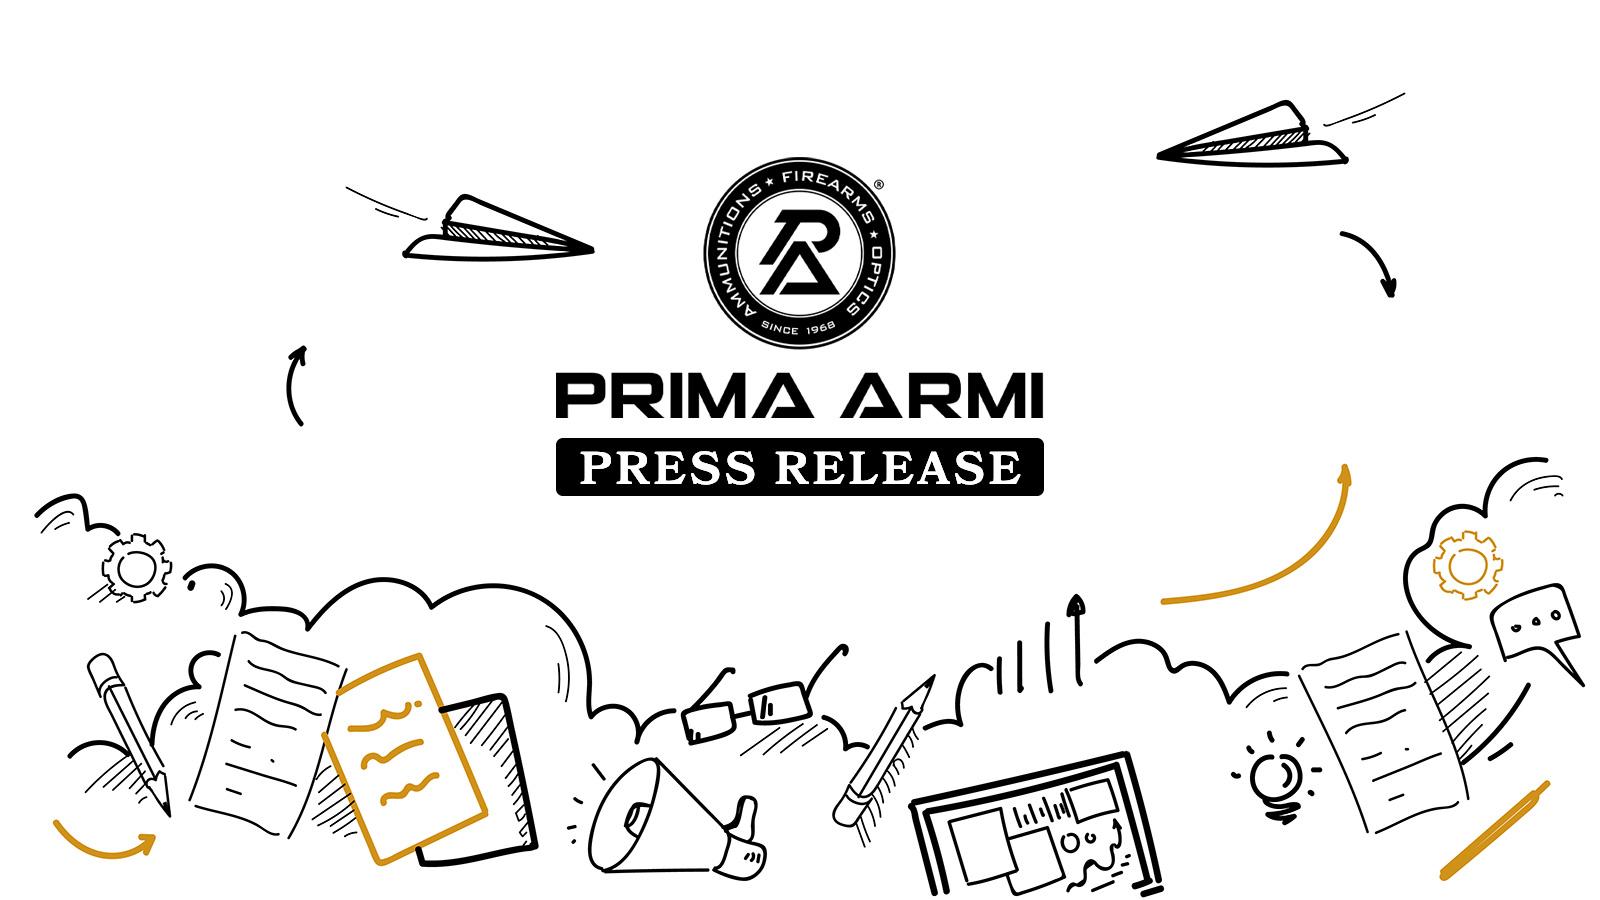 Press Release: Prima Armi è associata ad ANPAM